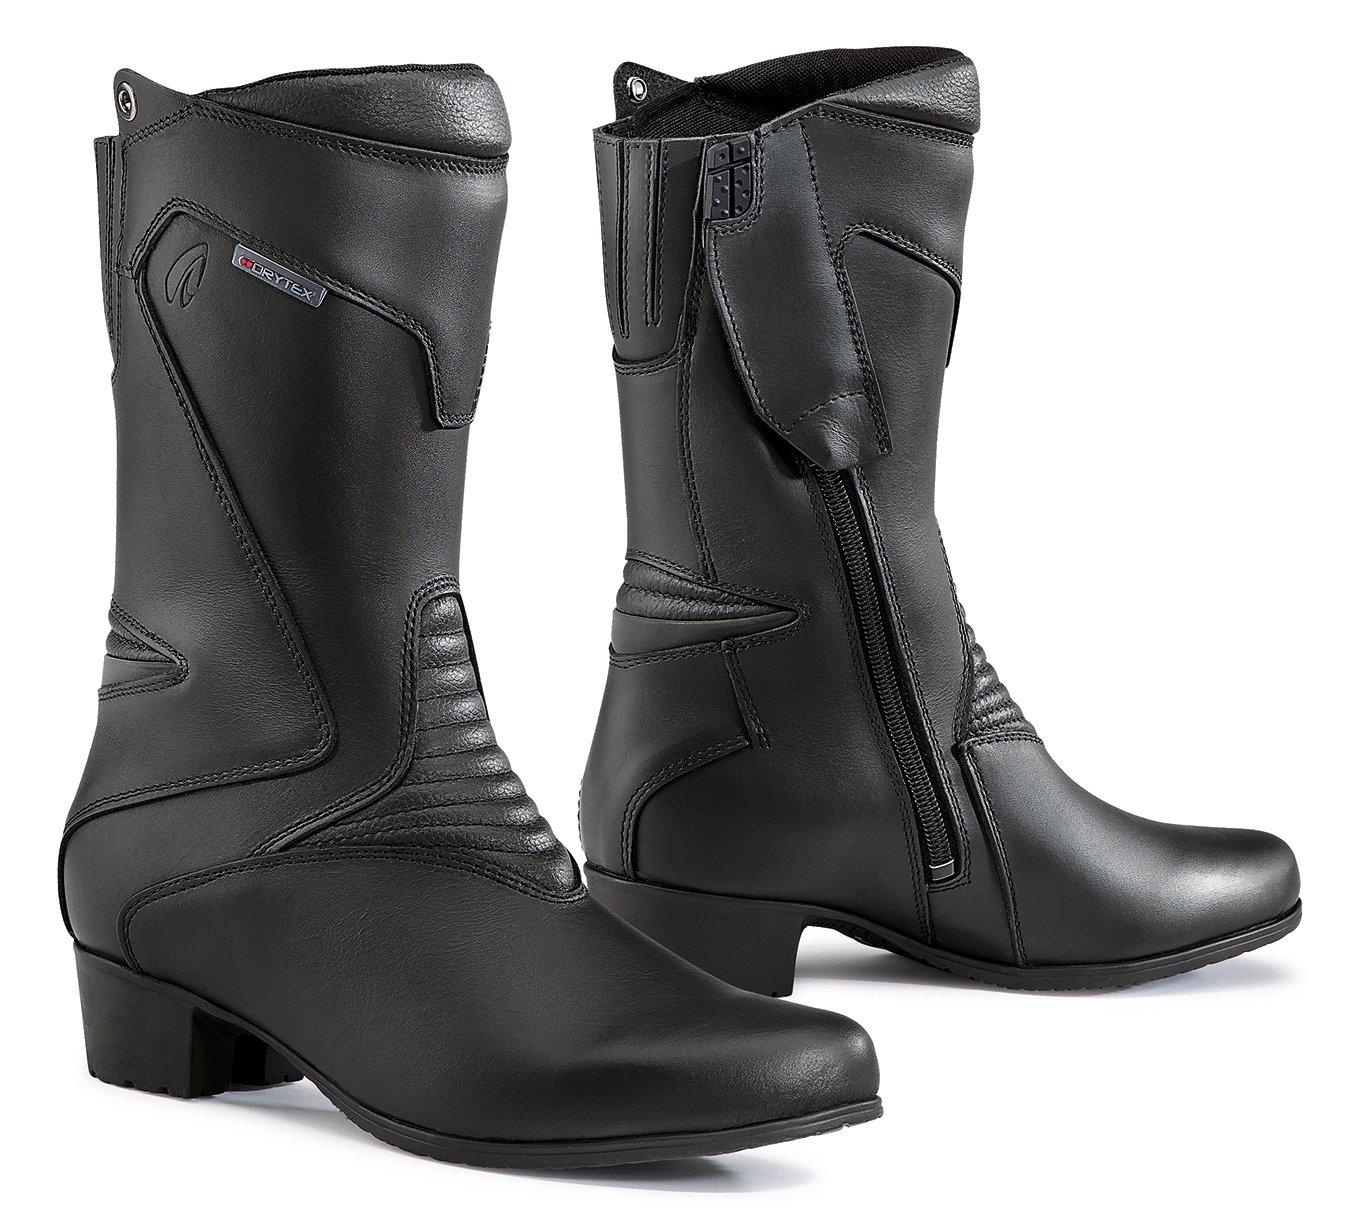 Forma Stiefel Moto Damen Ruby WP Eichzulassung CE, Schwarz, 35 FORMABOOTS FORT89W-99